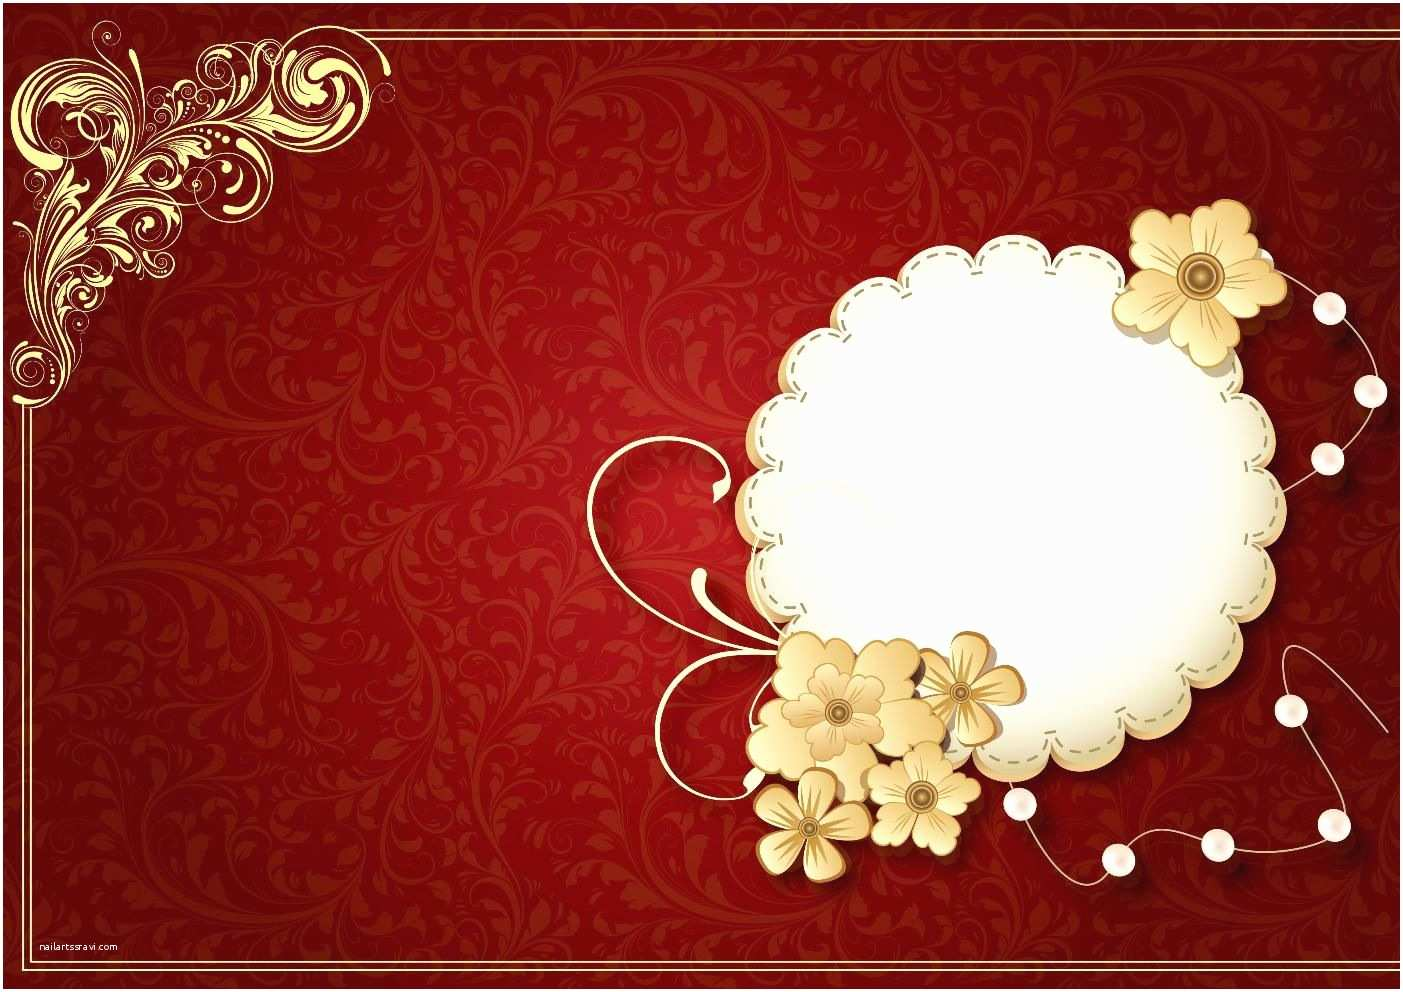 Design Wedding Invitations Online Invitation S Printing Line Wedding Invitation